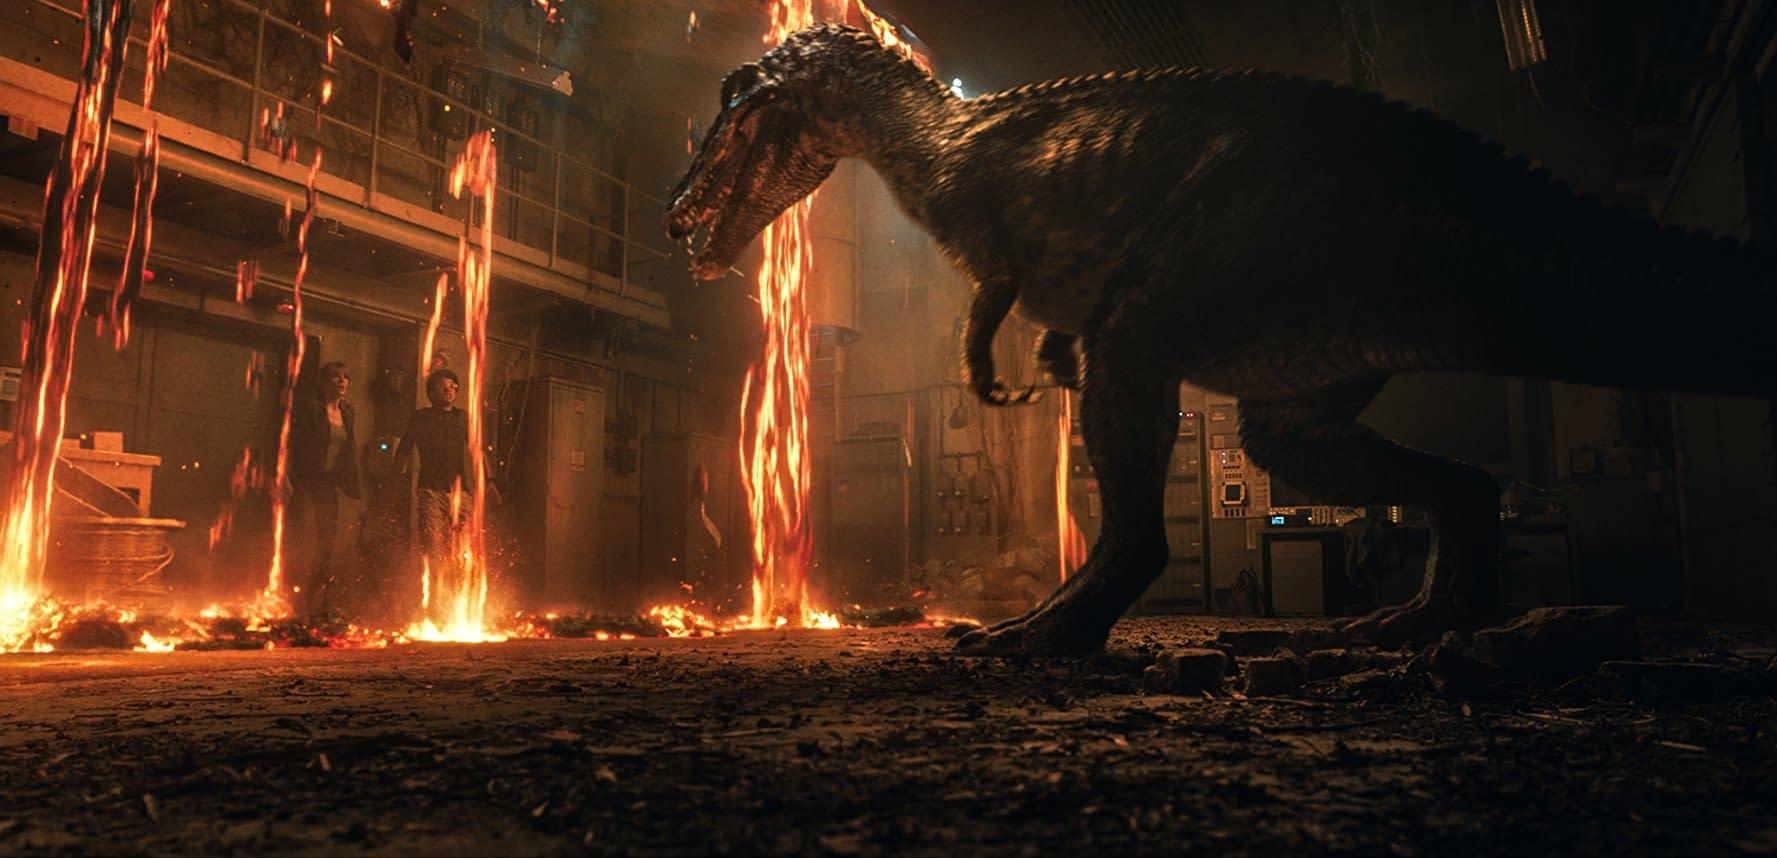 Jurassic World: Fallen Kingdom – The Volcano, the Island, and the Brachiosaur [Spoilers]